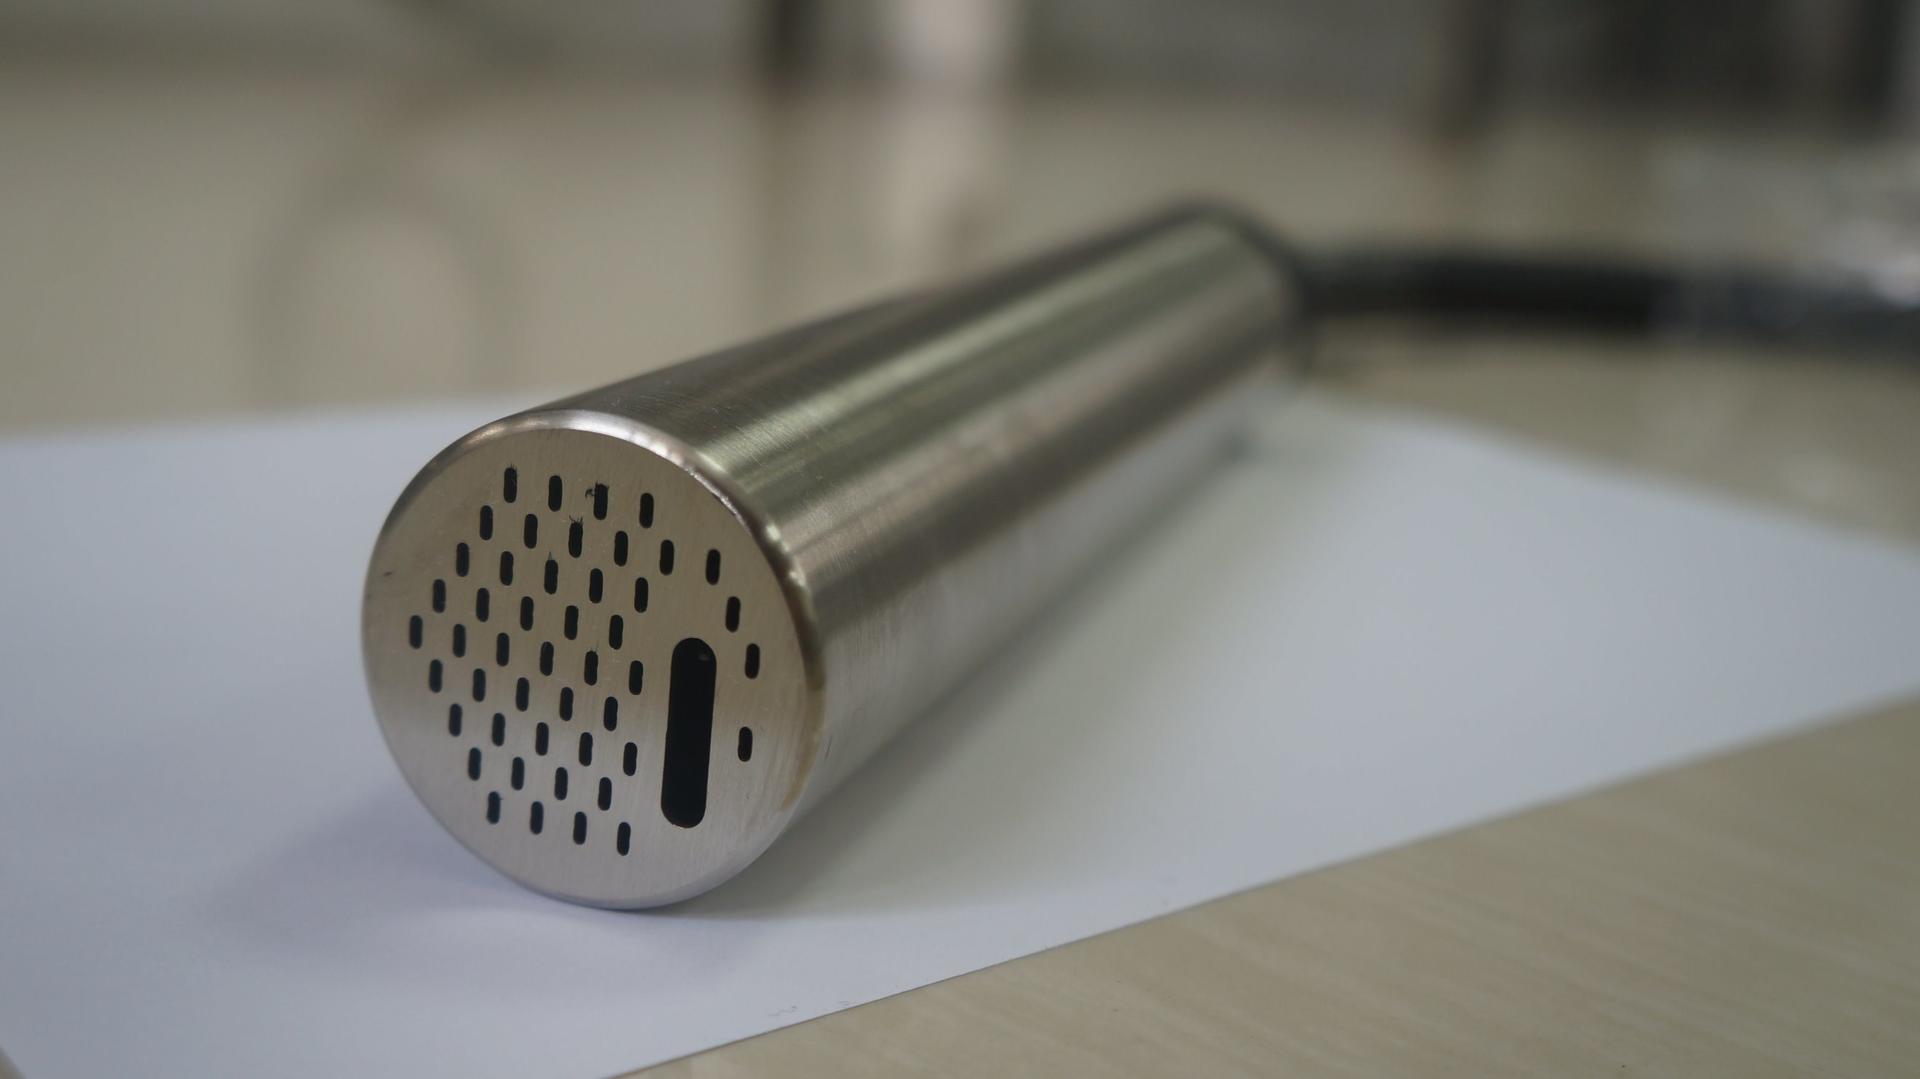 Lead Tech Lt800 Laser Engraving Printer